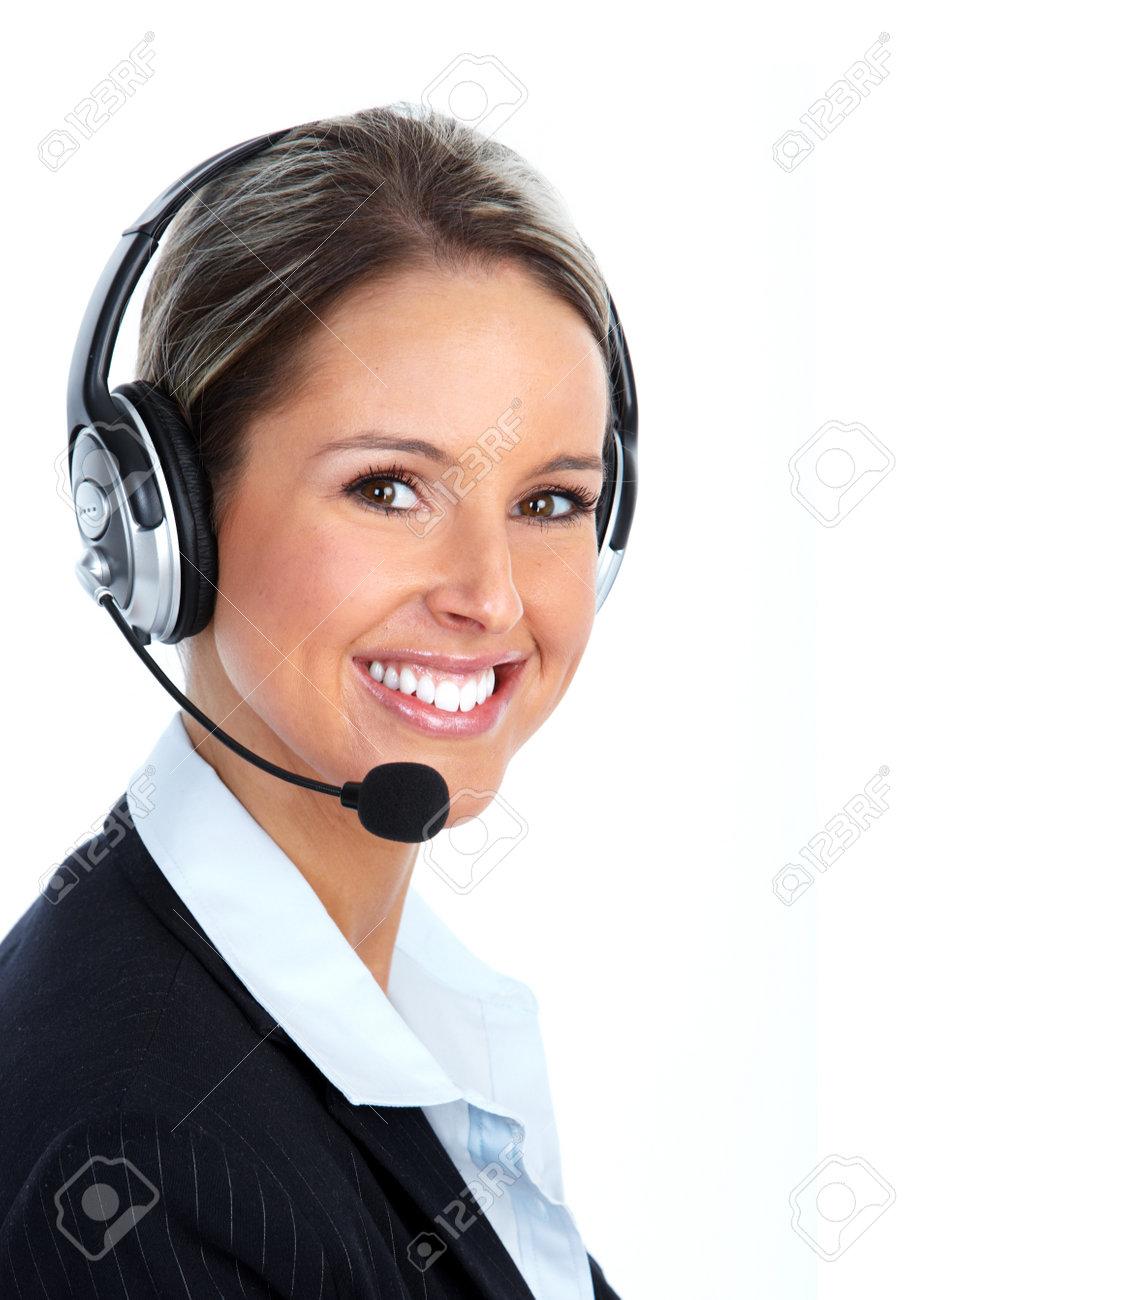 Call customer center operator. Stock Photo - 12379172